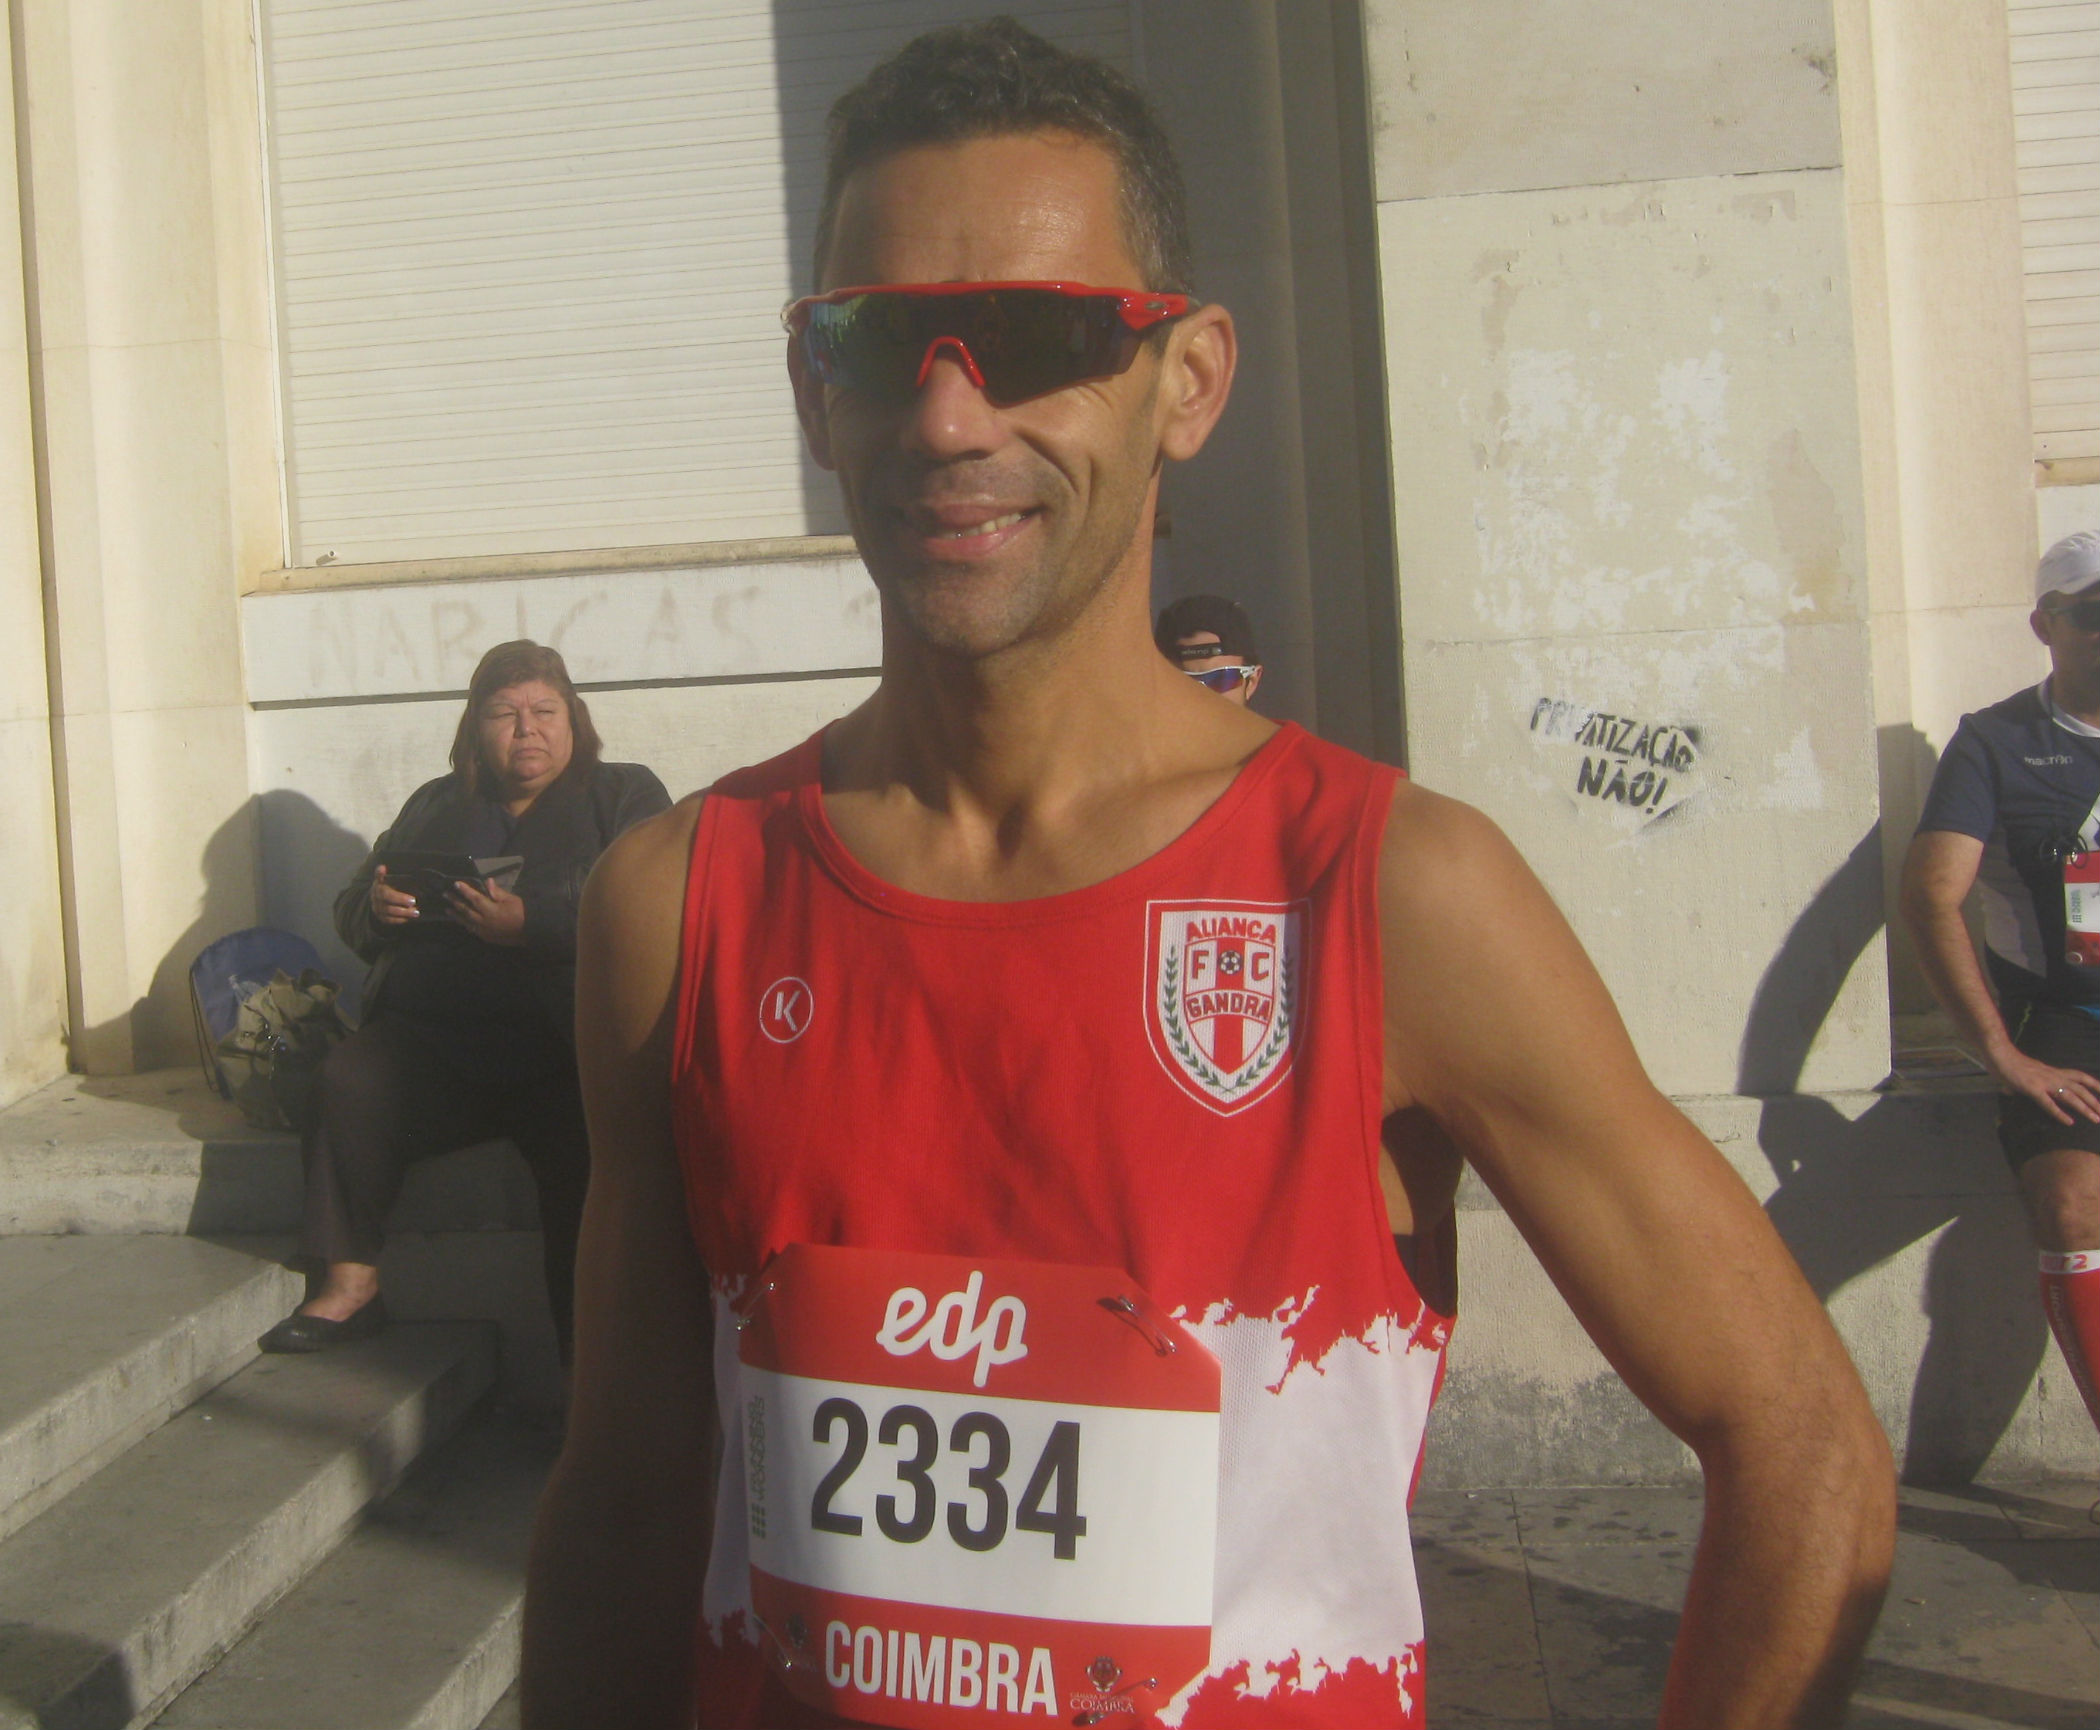 meia-maratona-coimbra2017-a